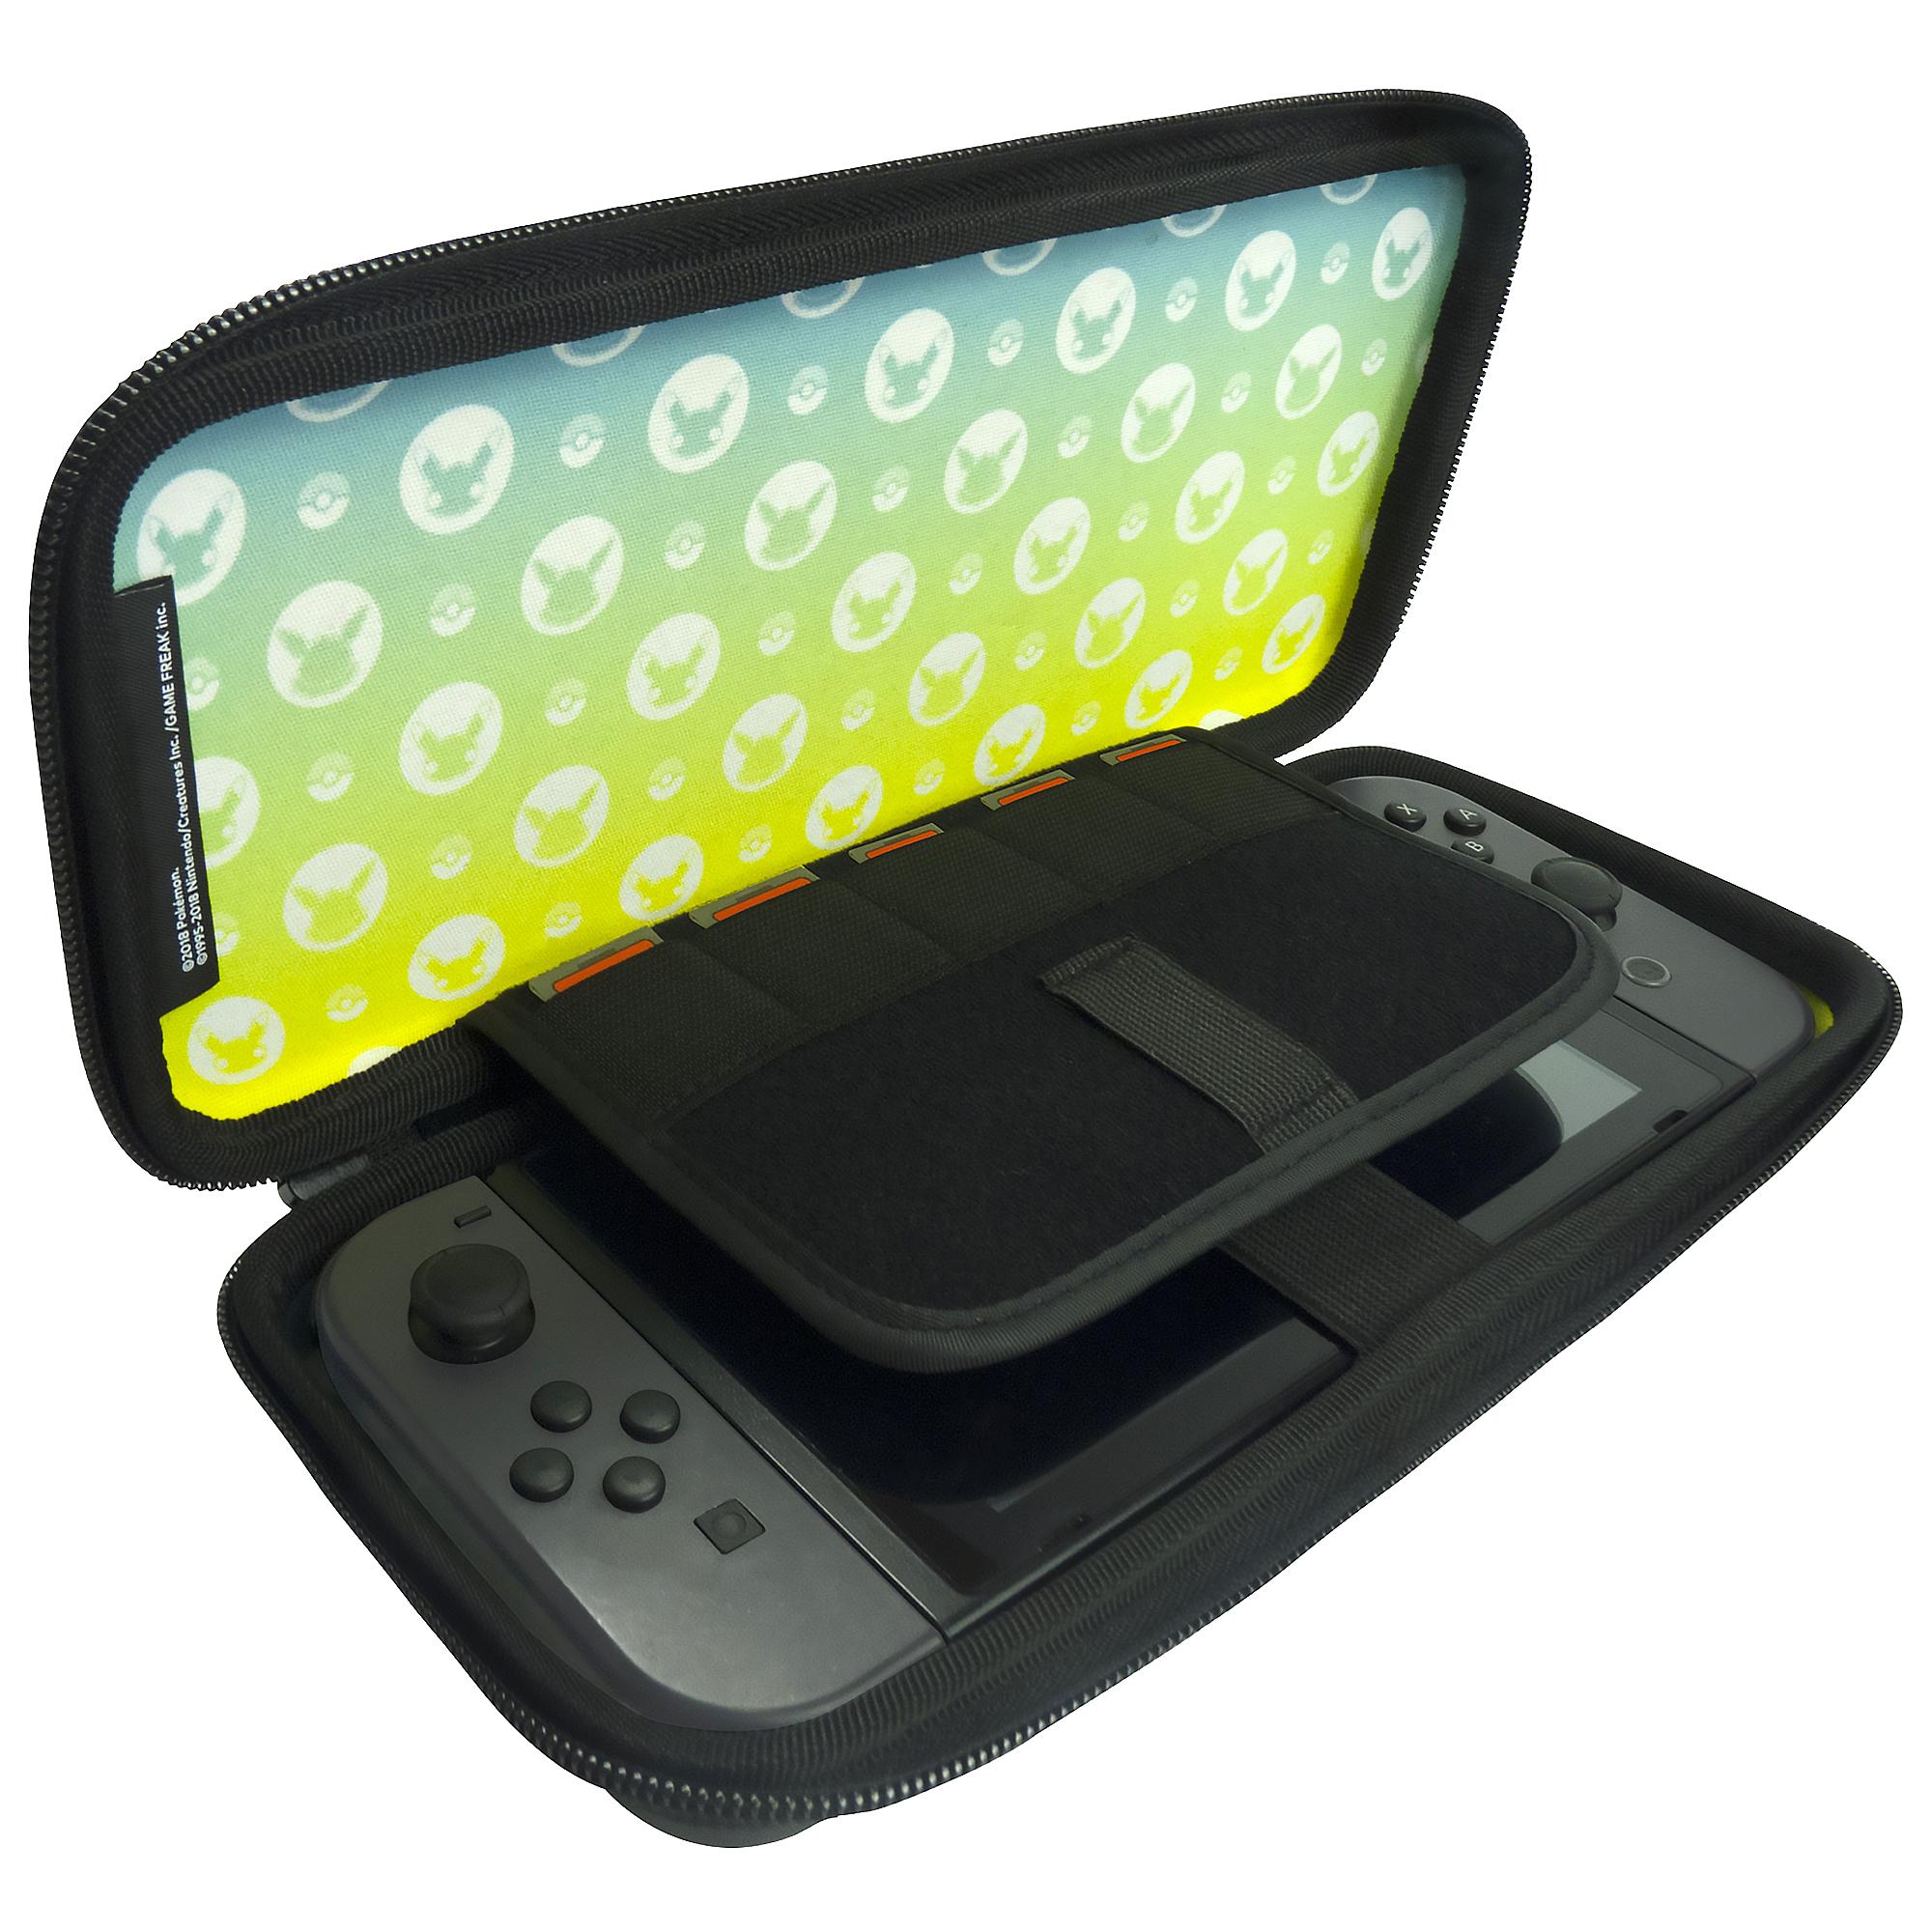 78f6af83810a ... Nintendo Switch Защитный чехол Hori (LET'S GO!) для консоли Switch (NSW-  ...